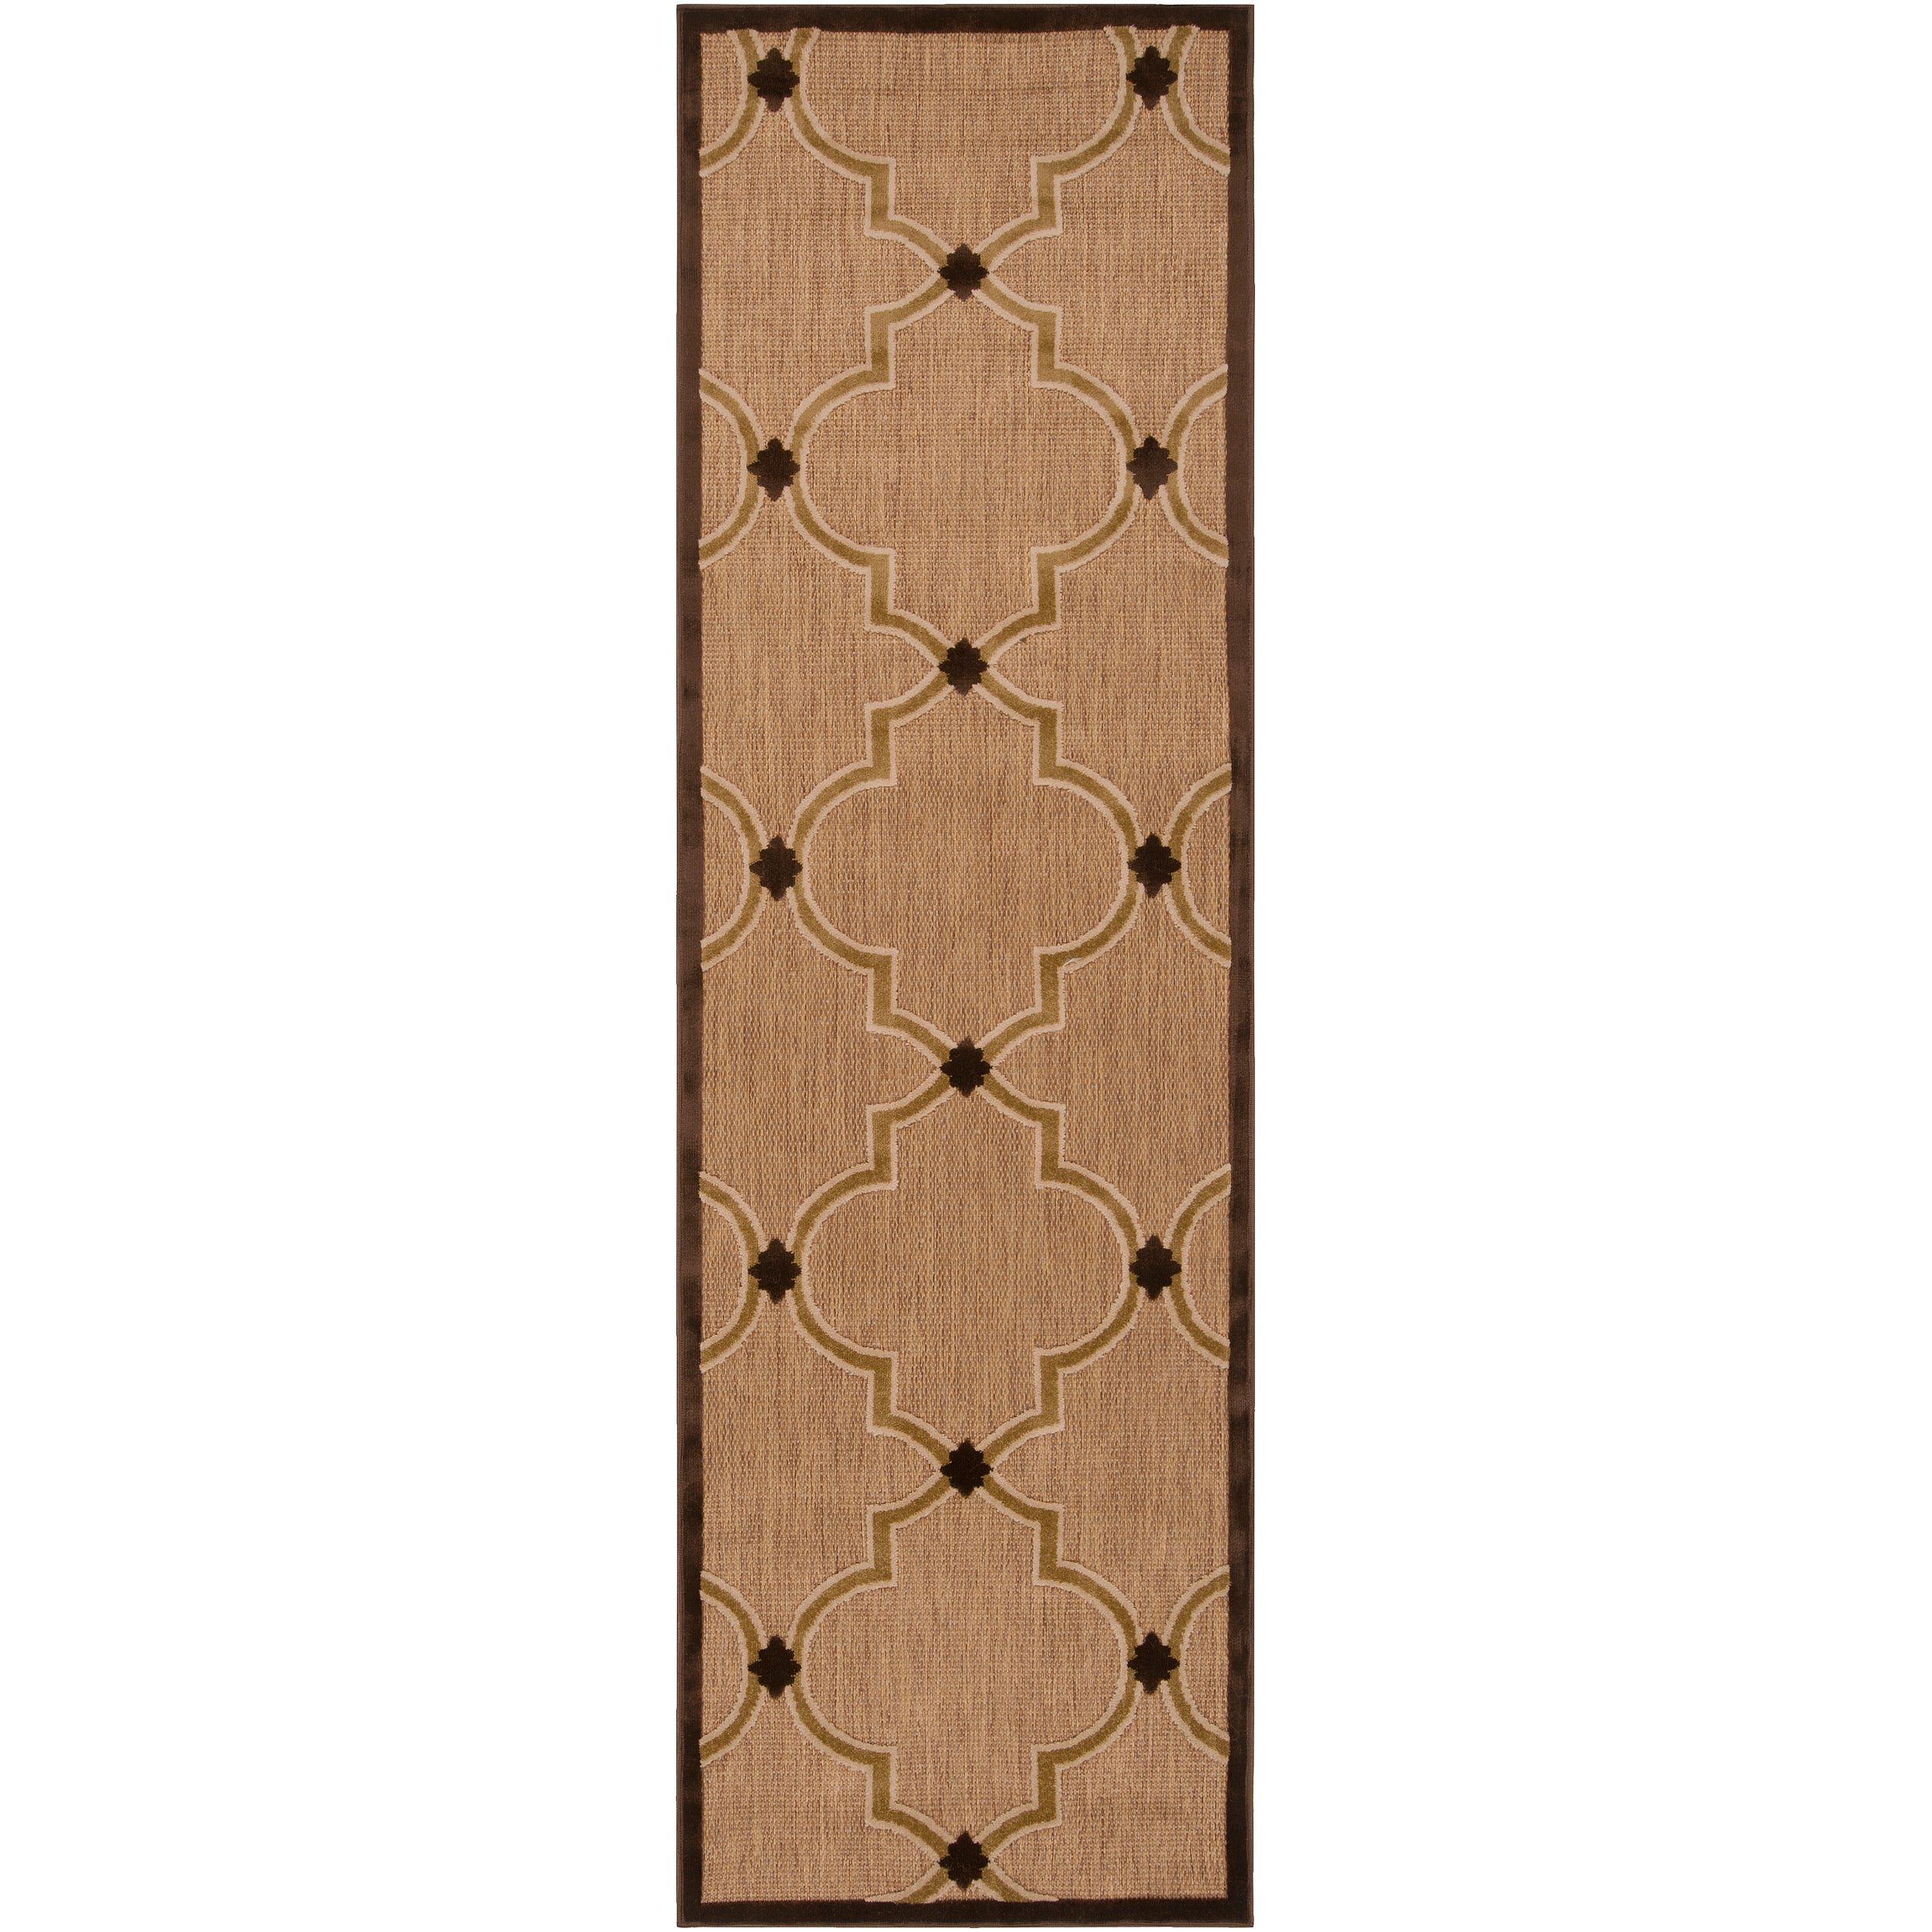 Woven Tan Remington Indoor/Outdoor Moroccan Lattice Rug (2